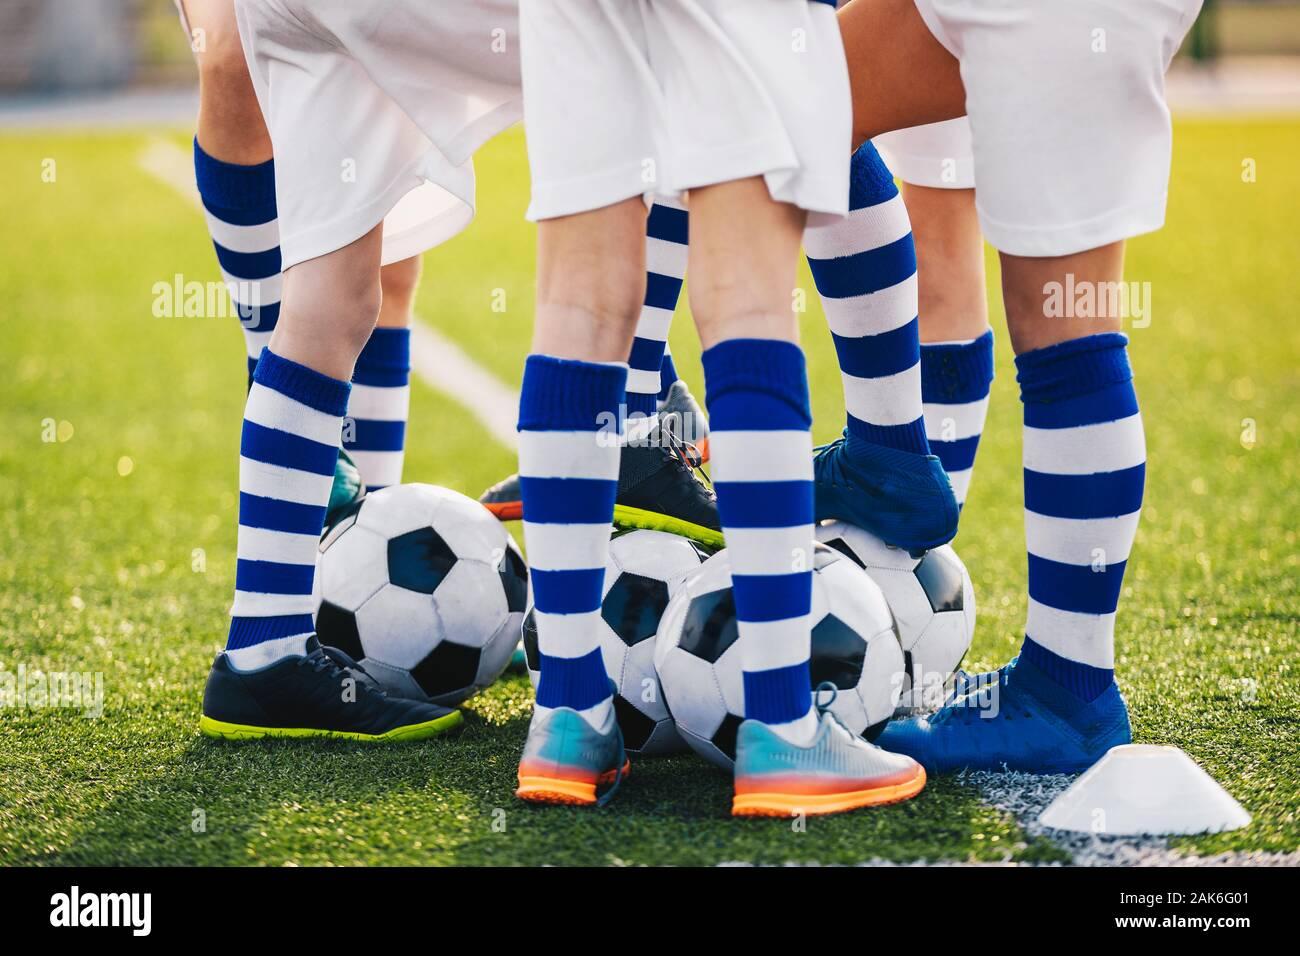 Baby Boys Size 5-6 1-2 years Country Kids Denim Soccer Goal Socks